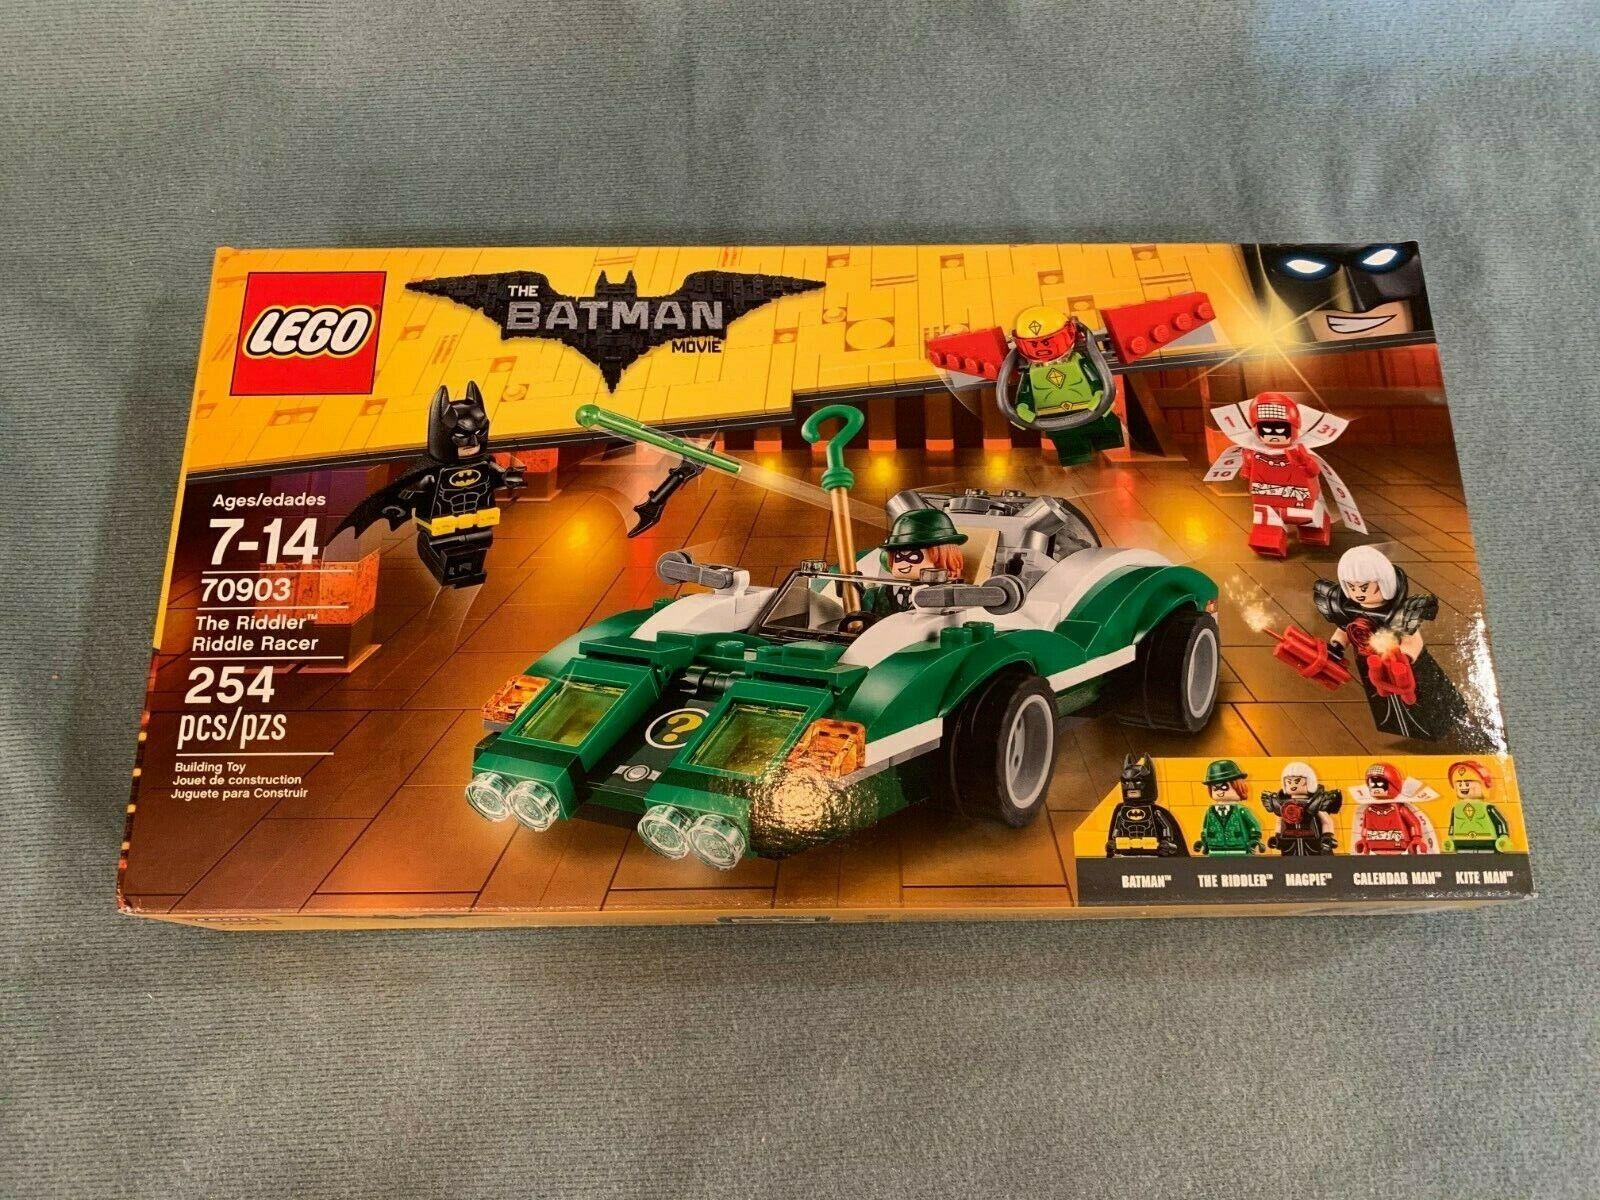 The LEGO Batman Movie - The Riddler; Riddle Racer 70903